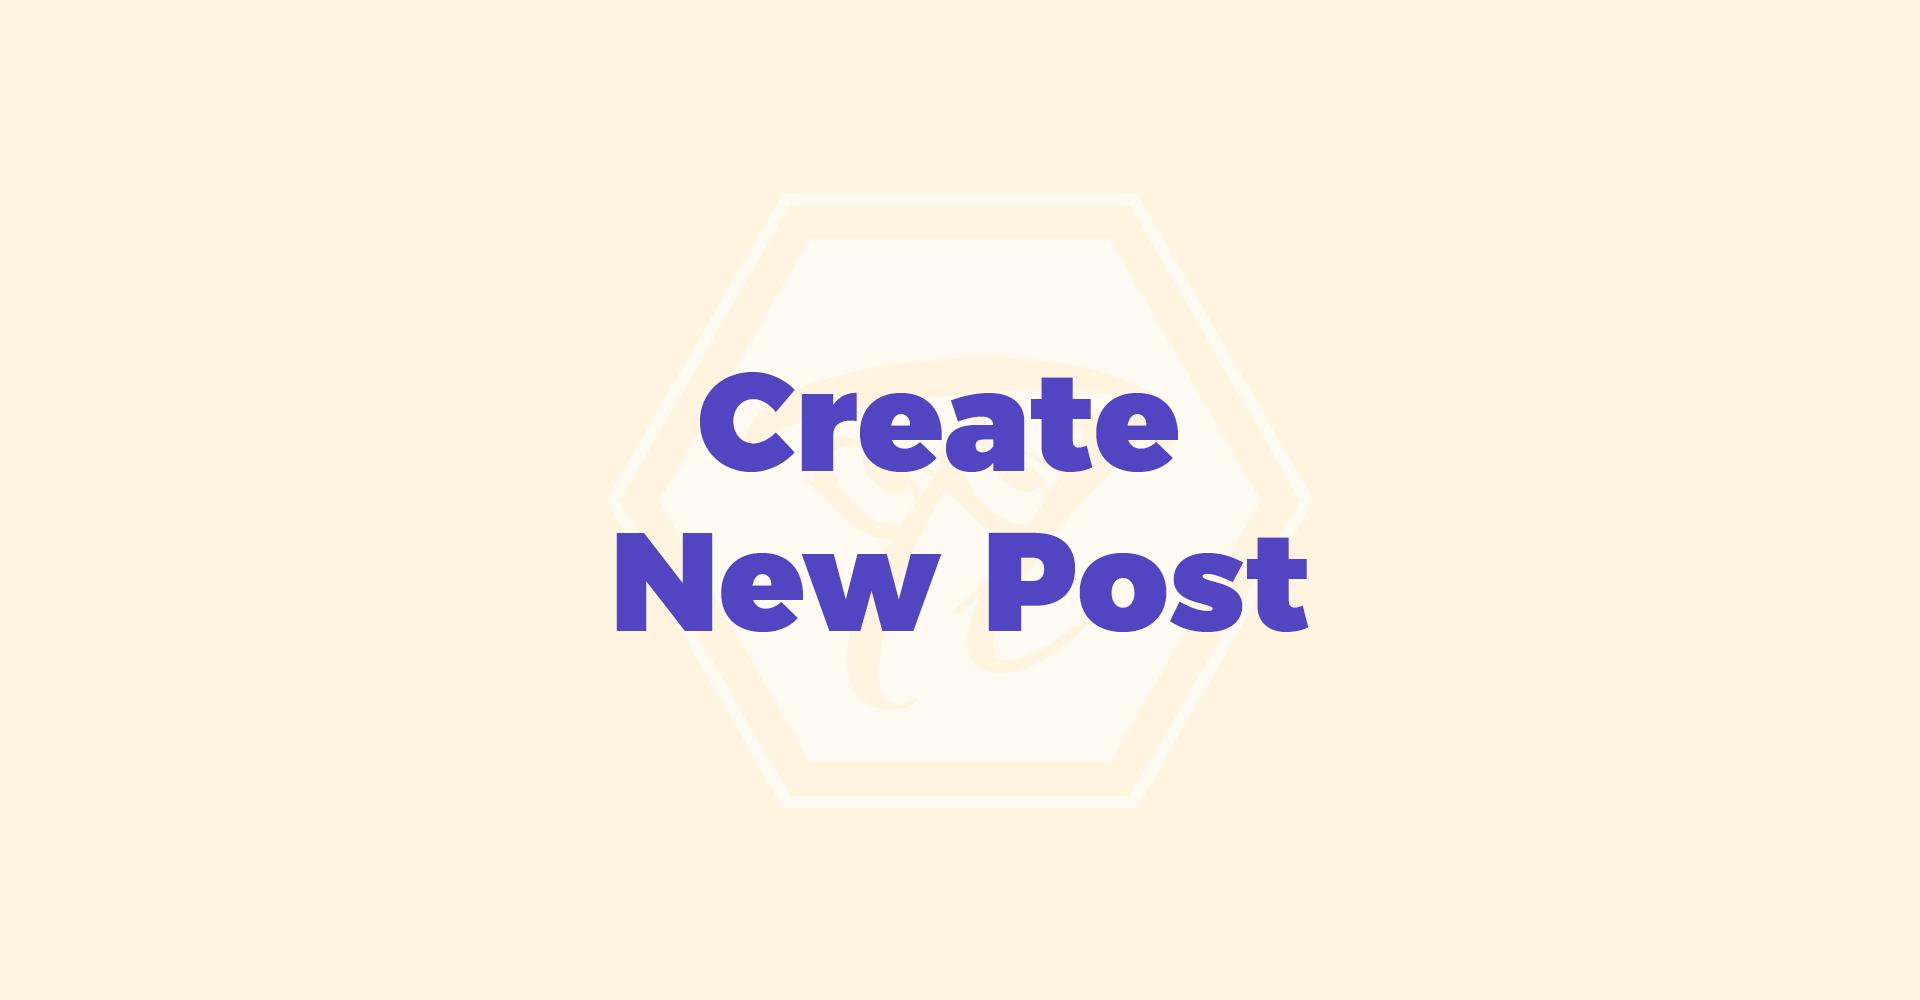 create__new_post 1 1